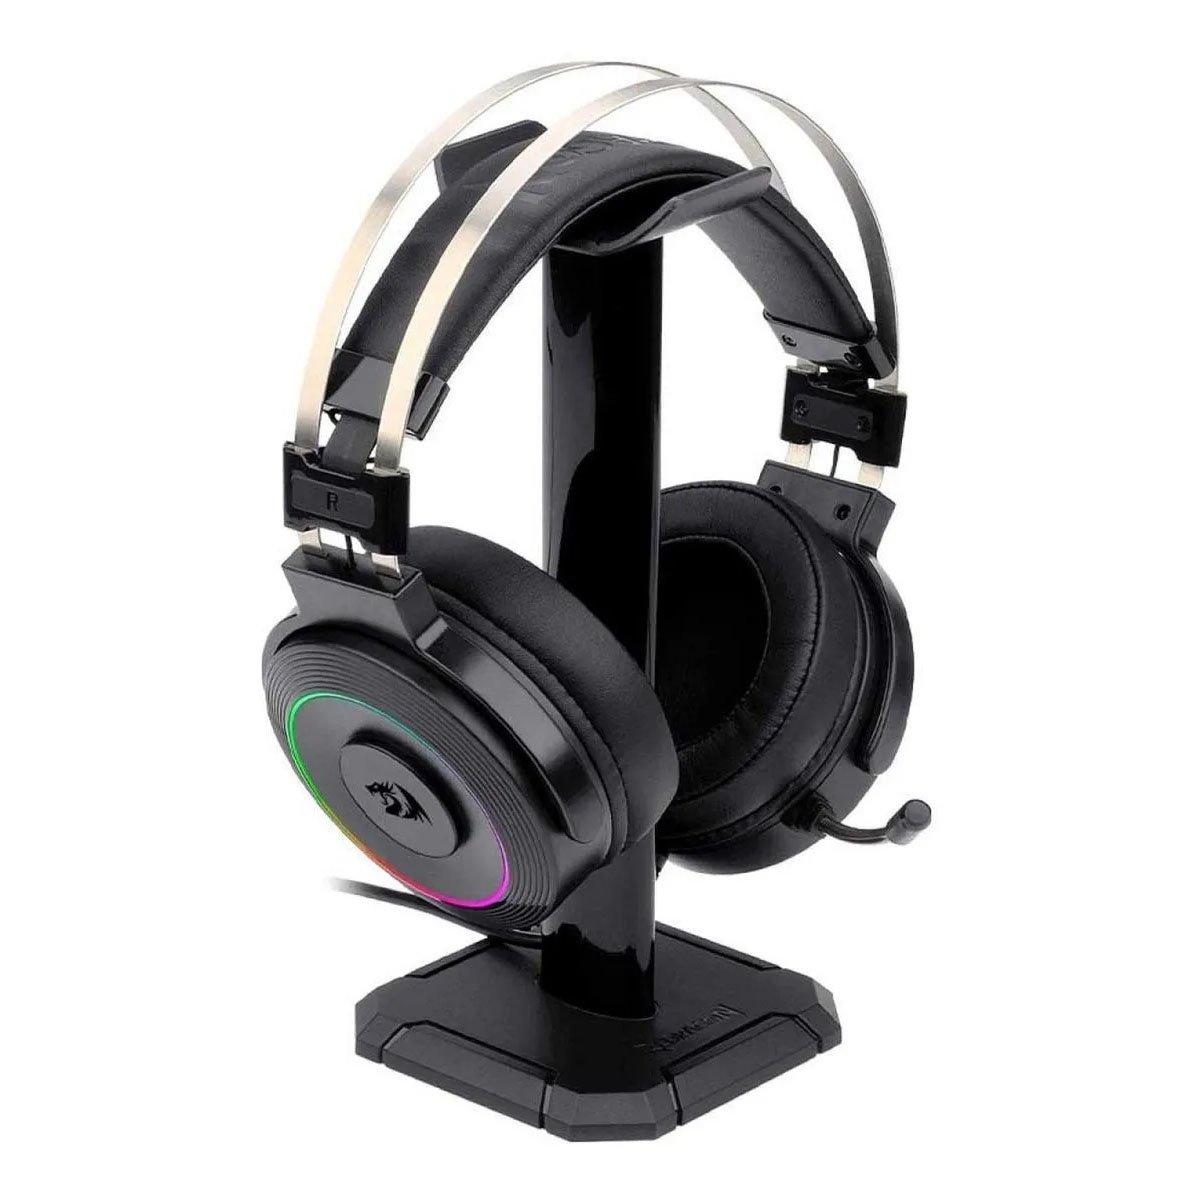 fone de ouvido com microfone gamer redragon usb lamia2 h320 rgb gaming preto 50979 2000 202963 3